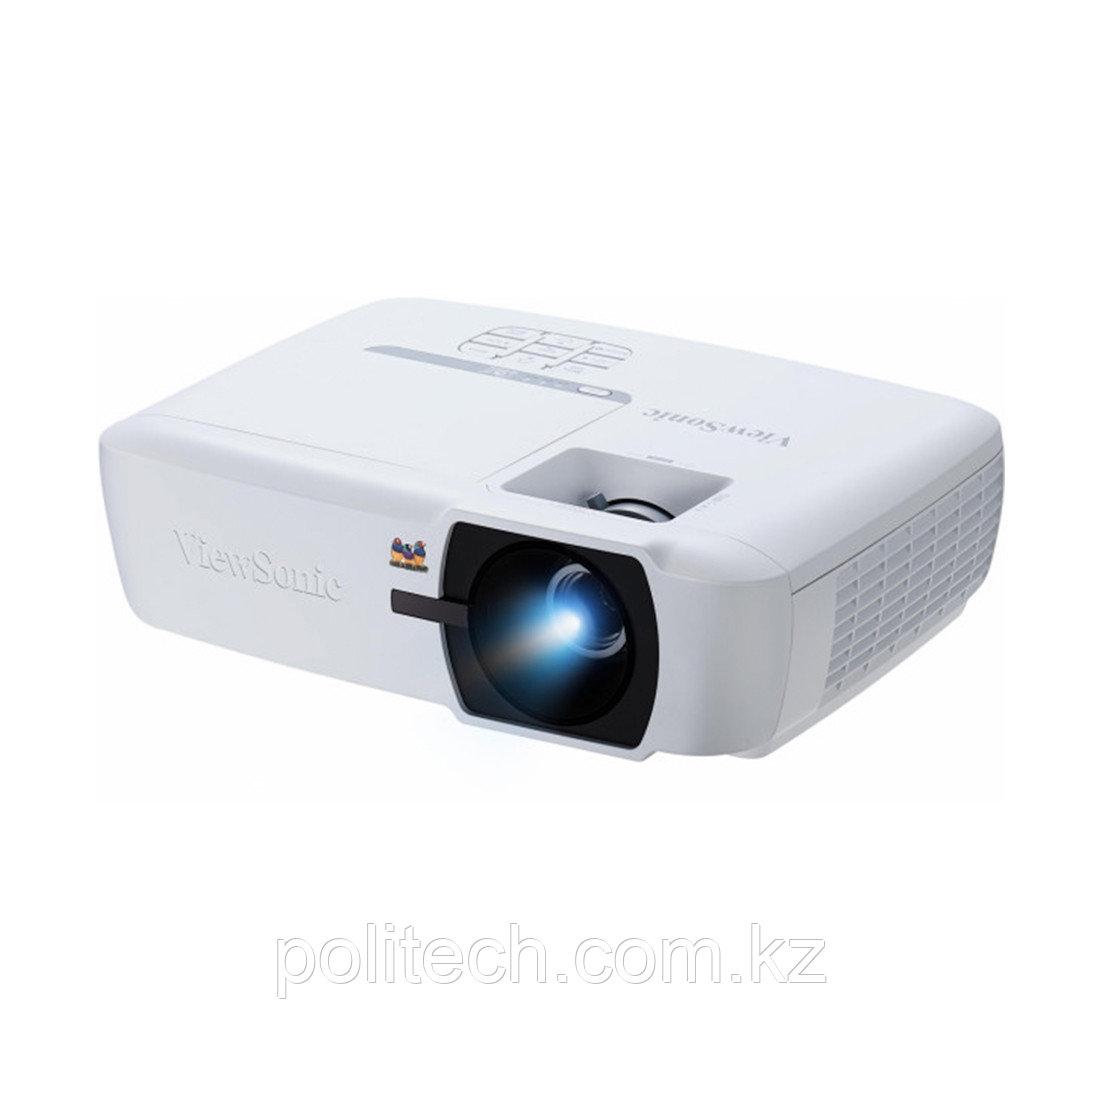 Проектор ViewSonic PA505W, 1280x800, 3500 люмен